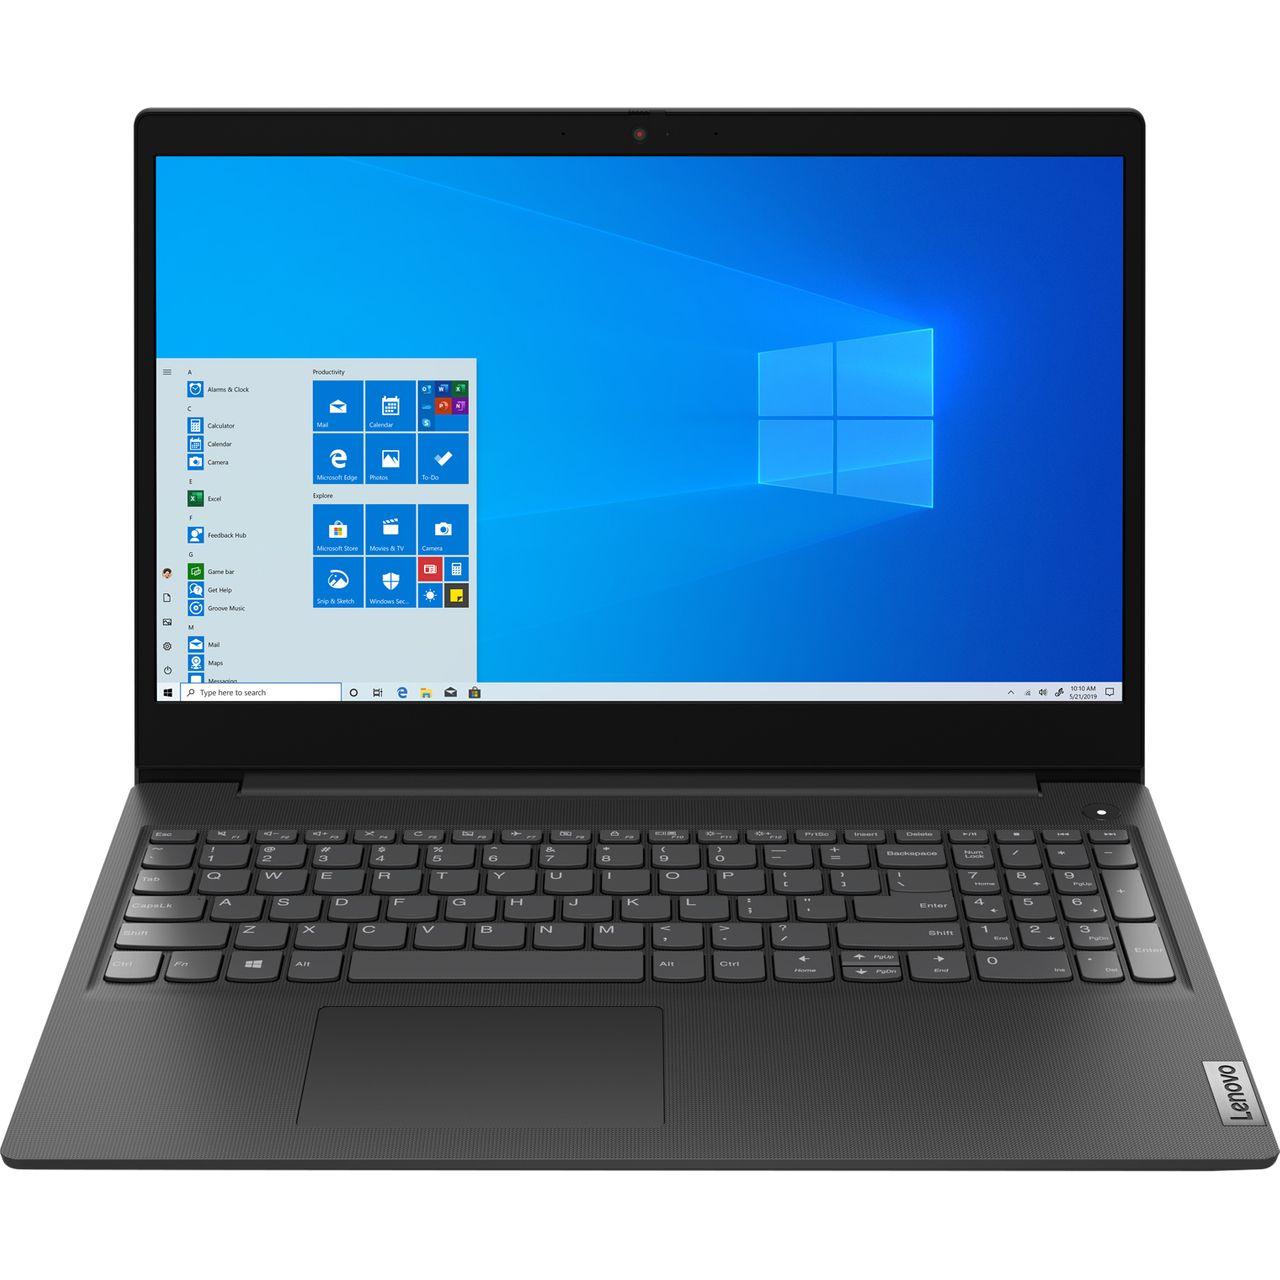 NOTEBOOK LENOVO IDEAPAD 3 I5 1135G7 UP TO 4.2GHz 8M 8G DDR4 HD 1T VGA NVIDIA 350MX 2G DDR5 15.6 GRAY ,Laptop Pc